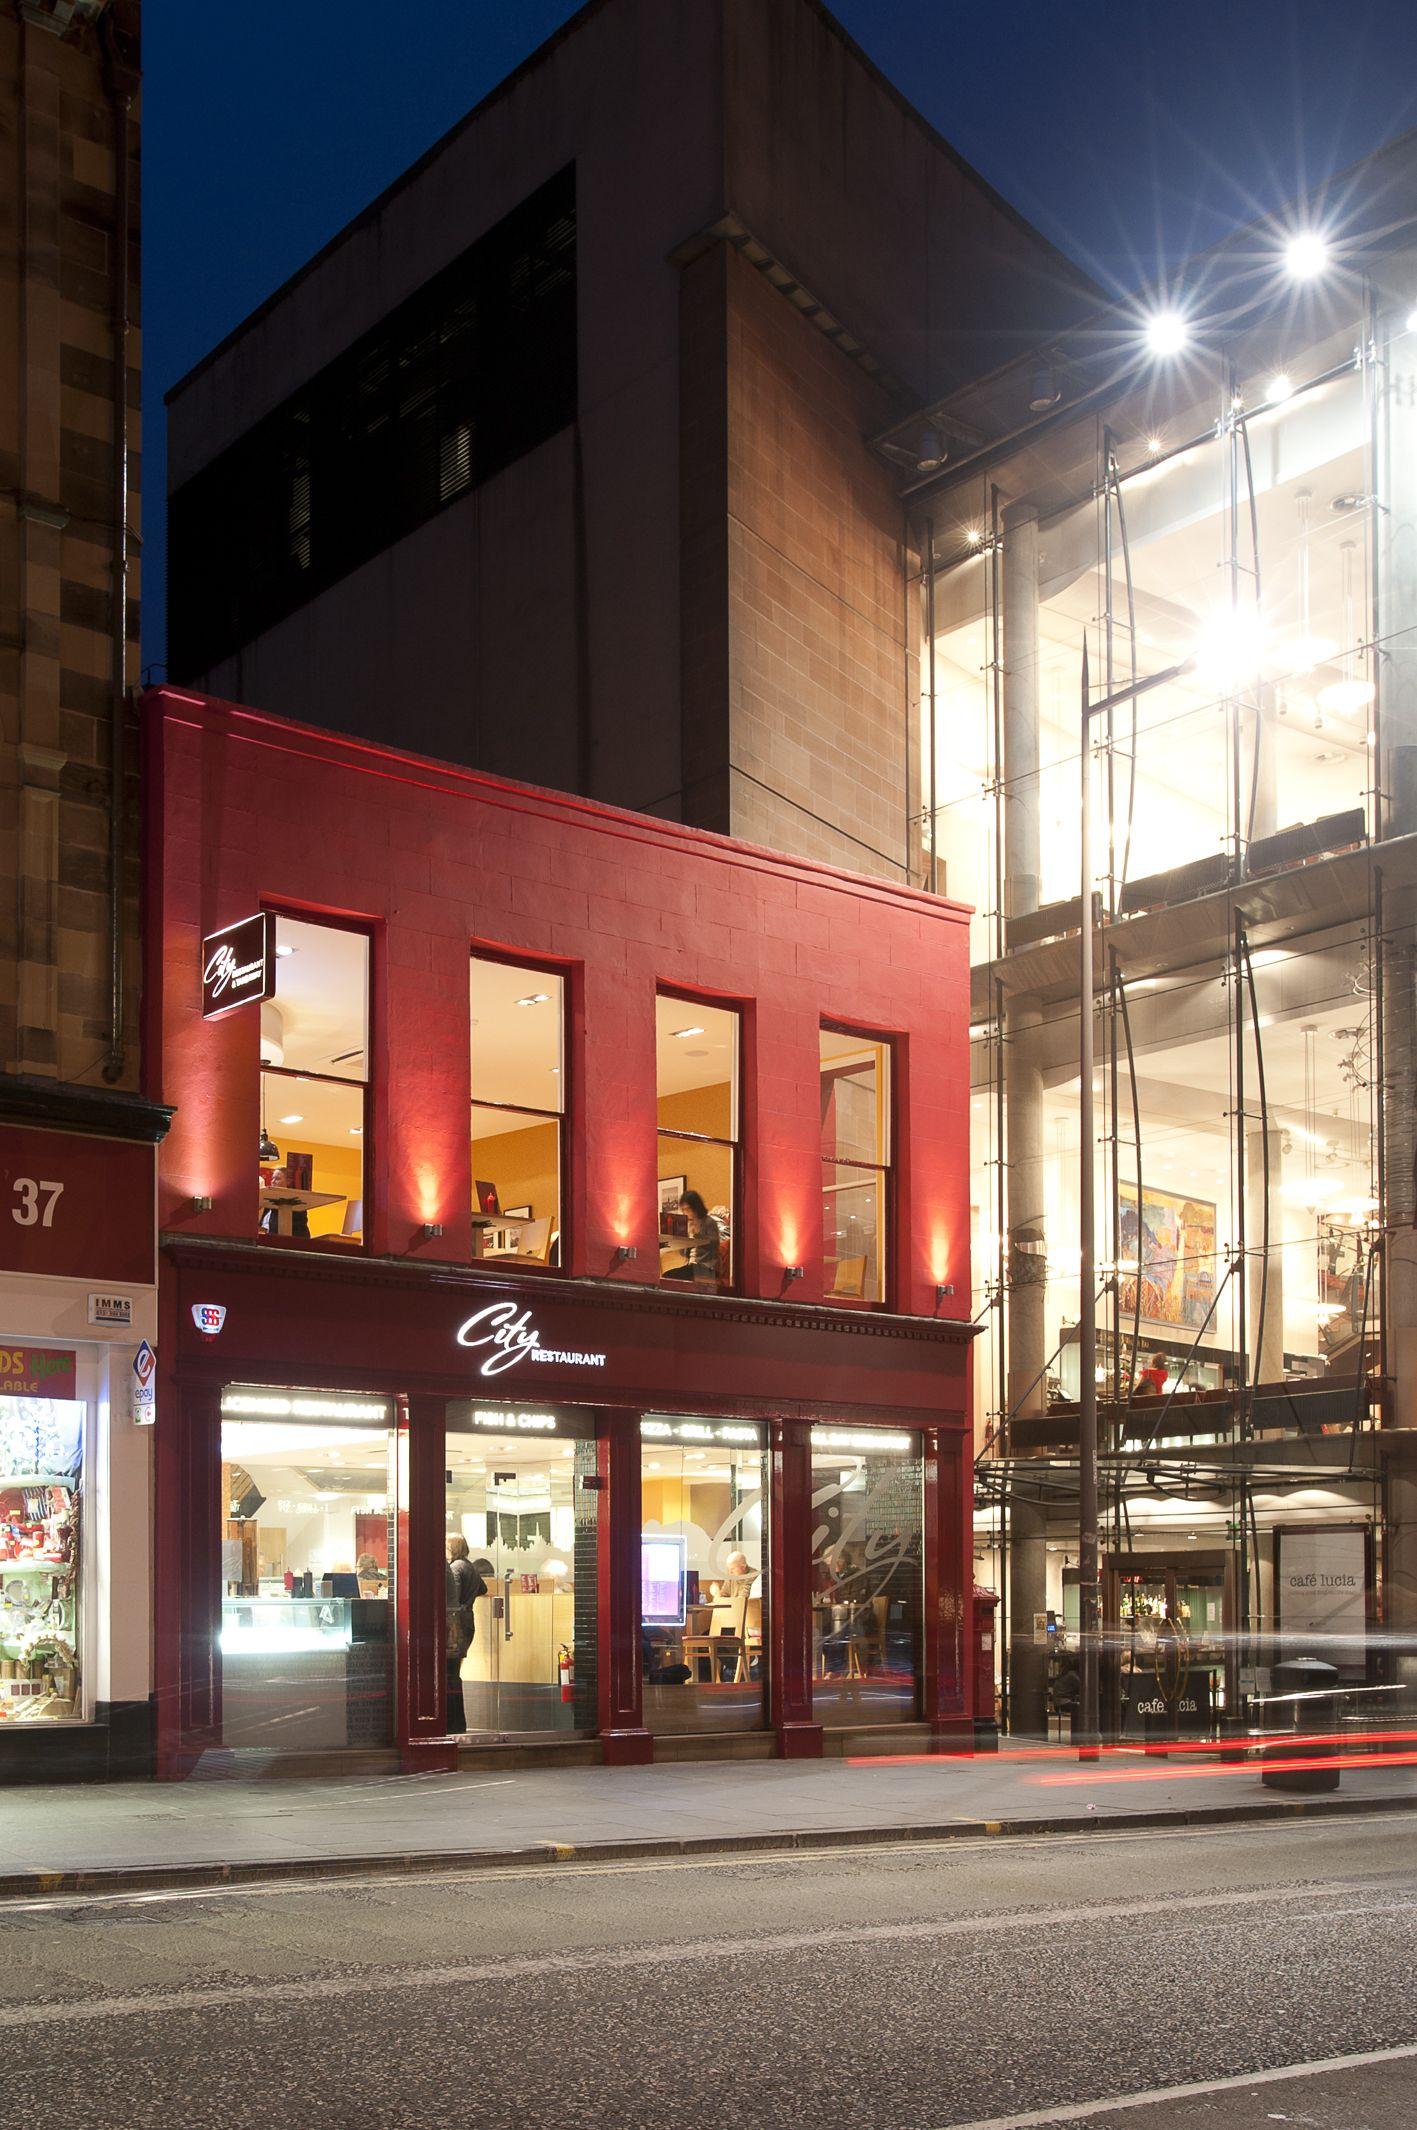 City Restaurant - Exterior | Restaurant exterior ...